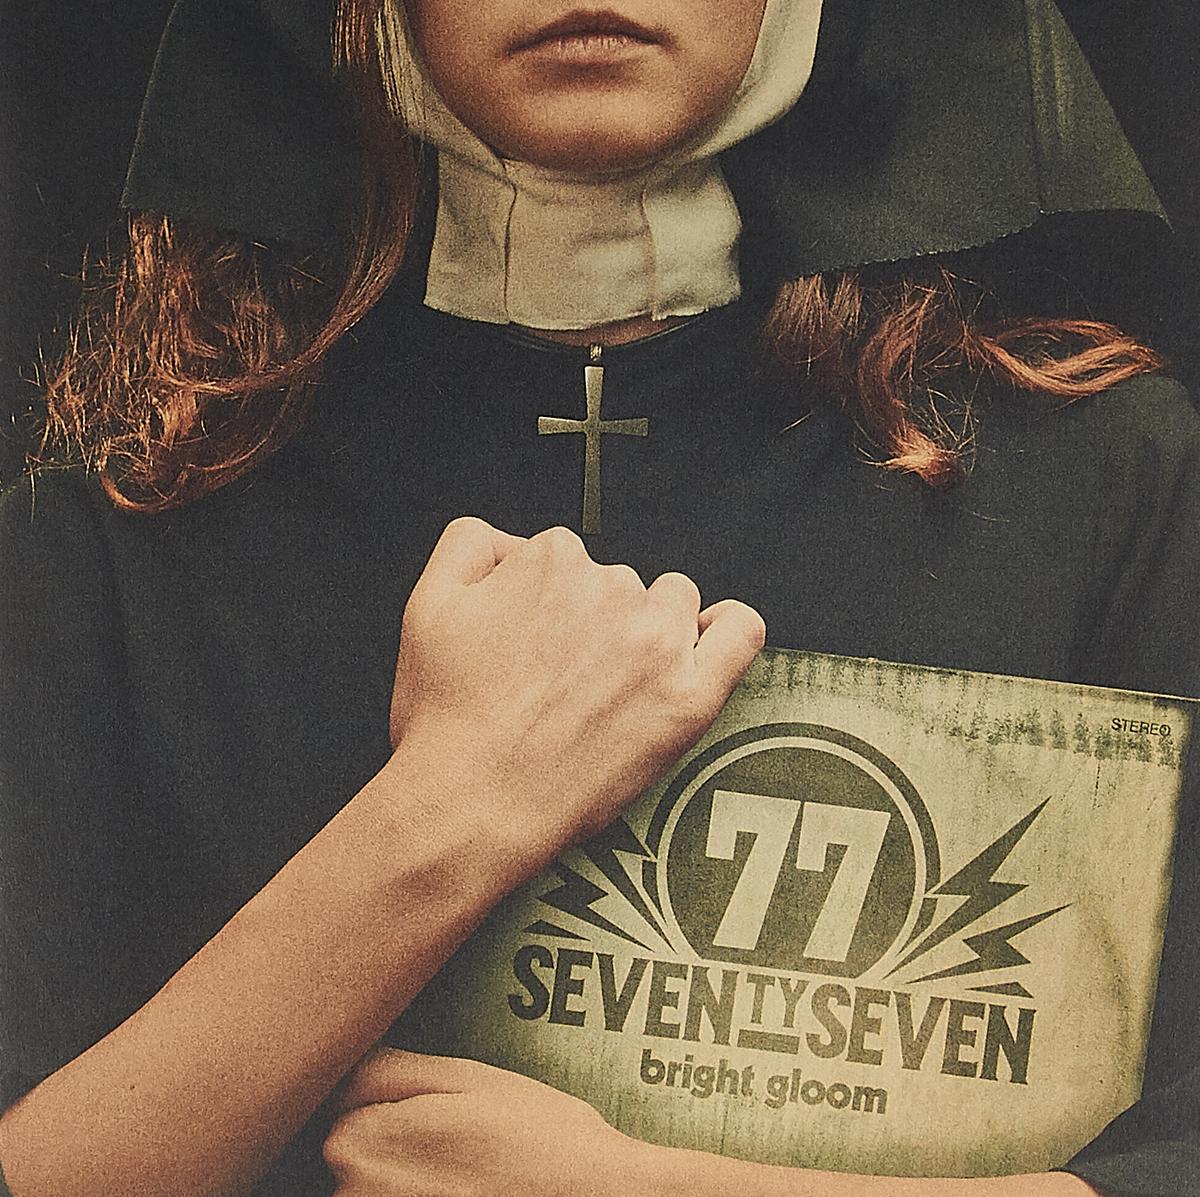 Seventyseven. Bright Gloom (LP + CD)